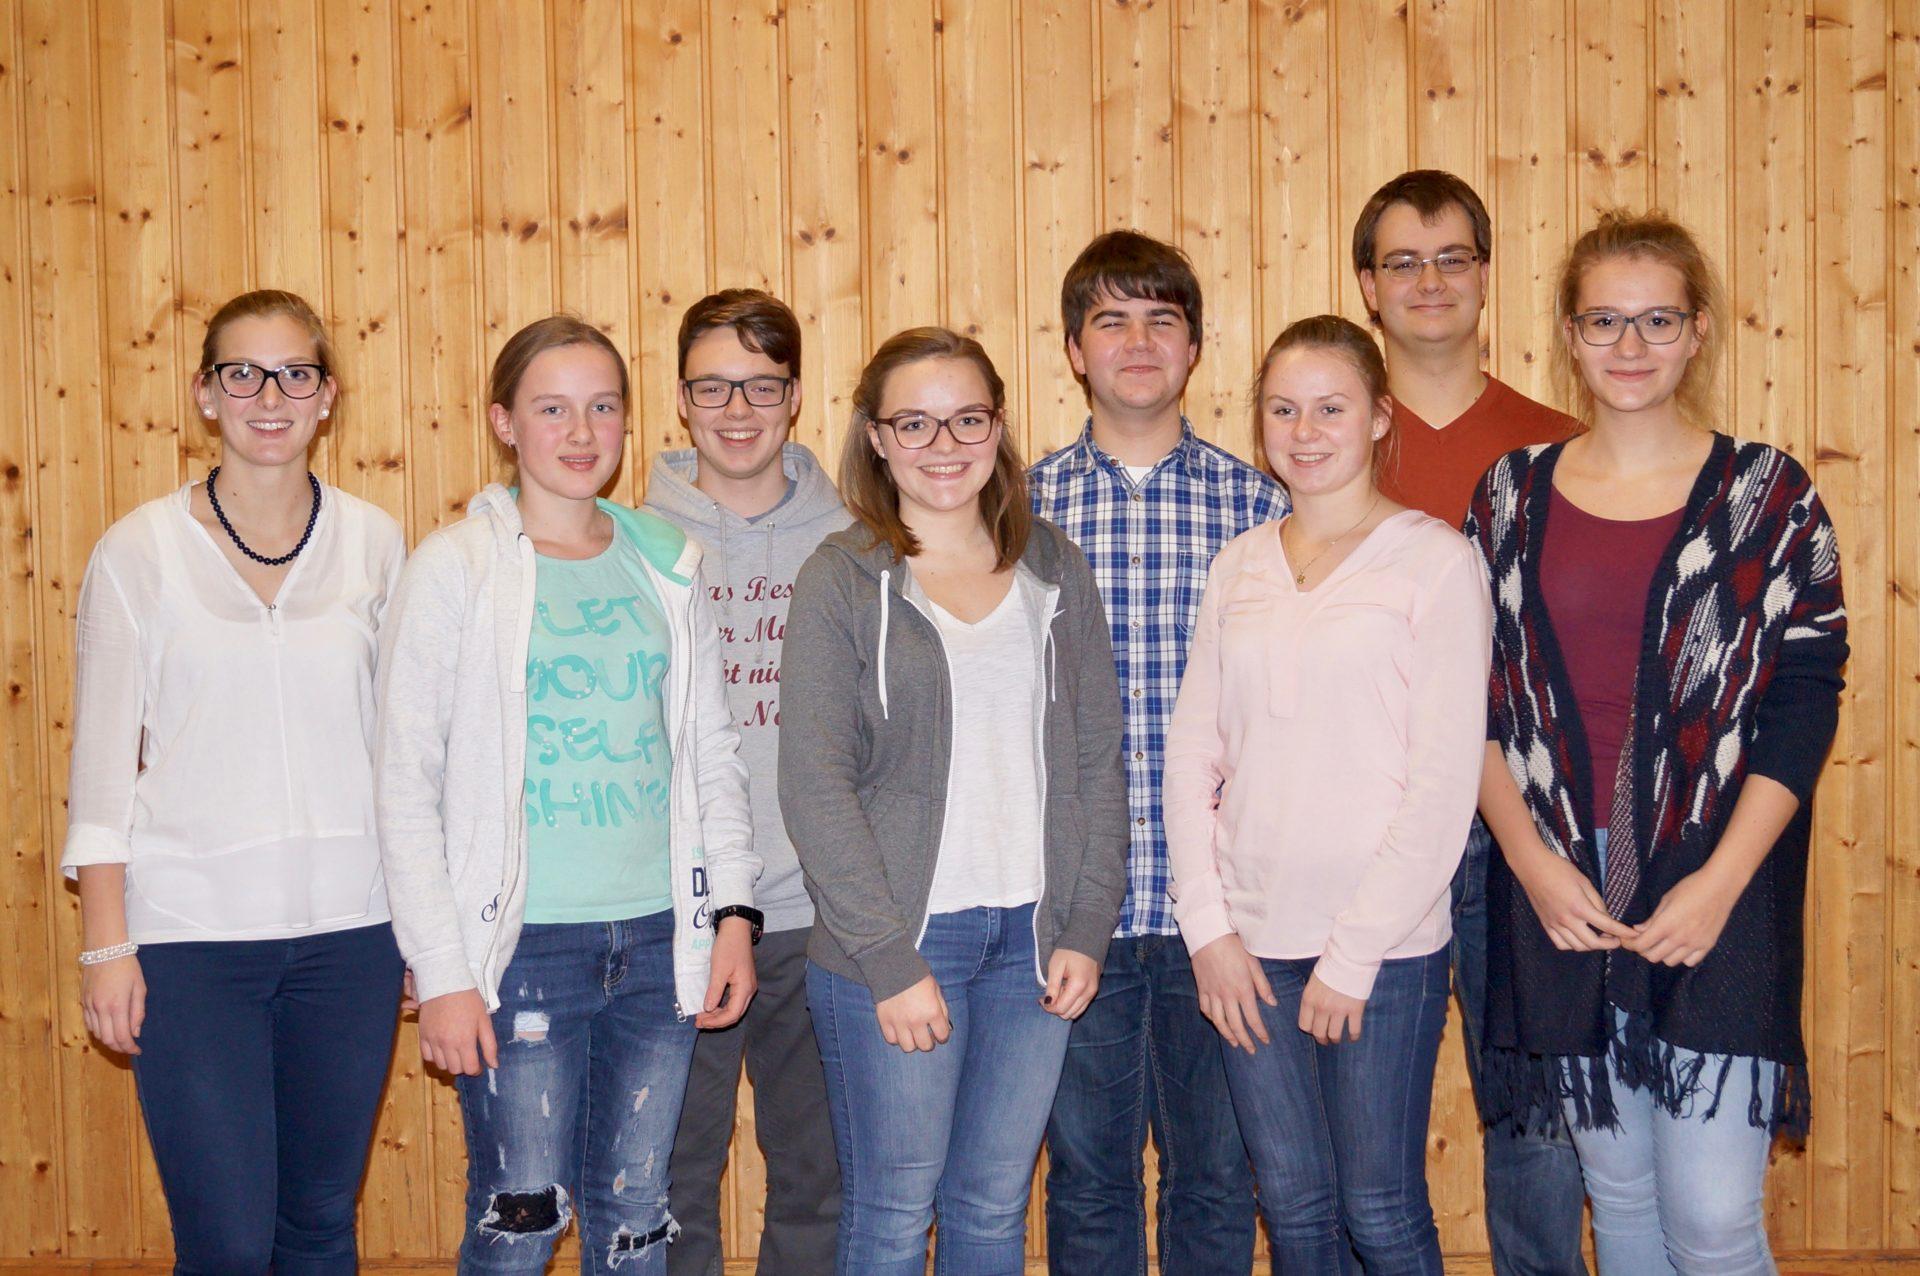 Jugendvorstandschaft Stadtkapelle Bobingen